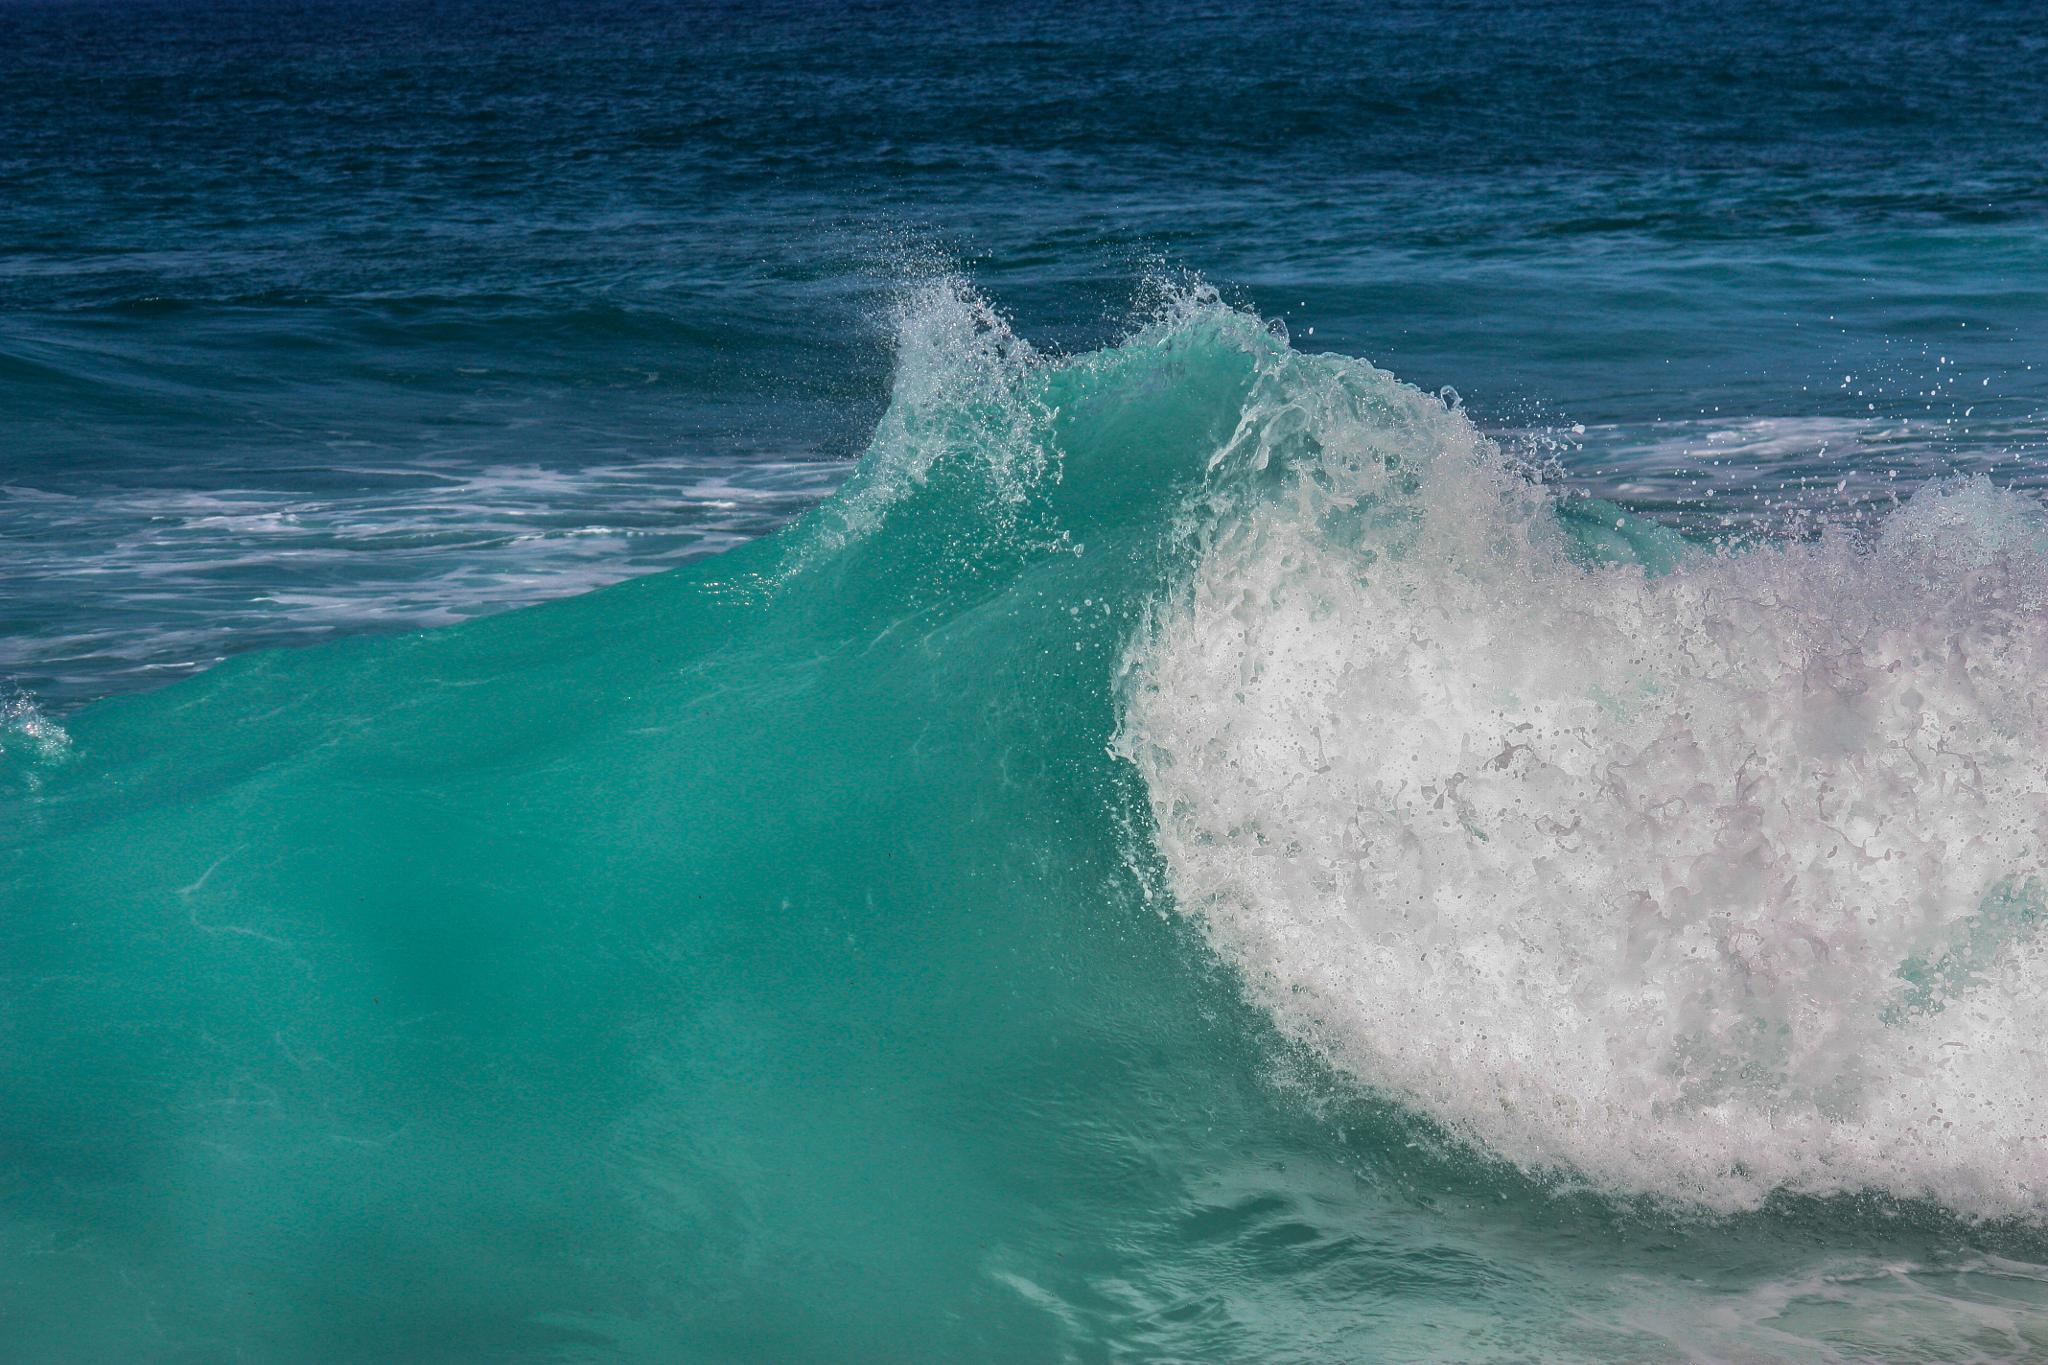 Hawaiian Wave by Sophia von Wrangell